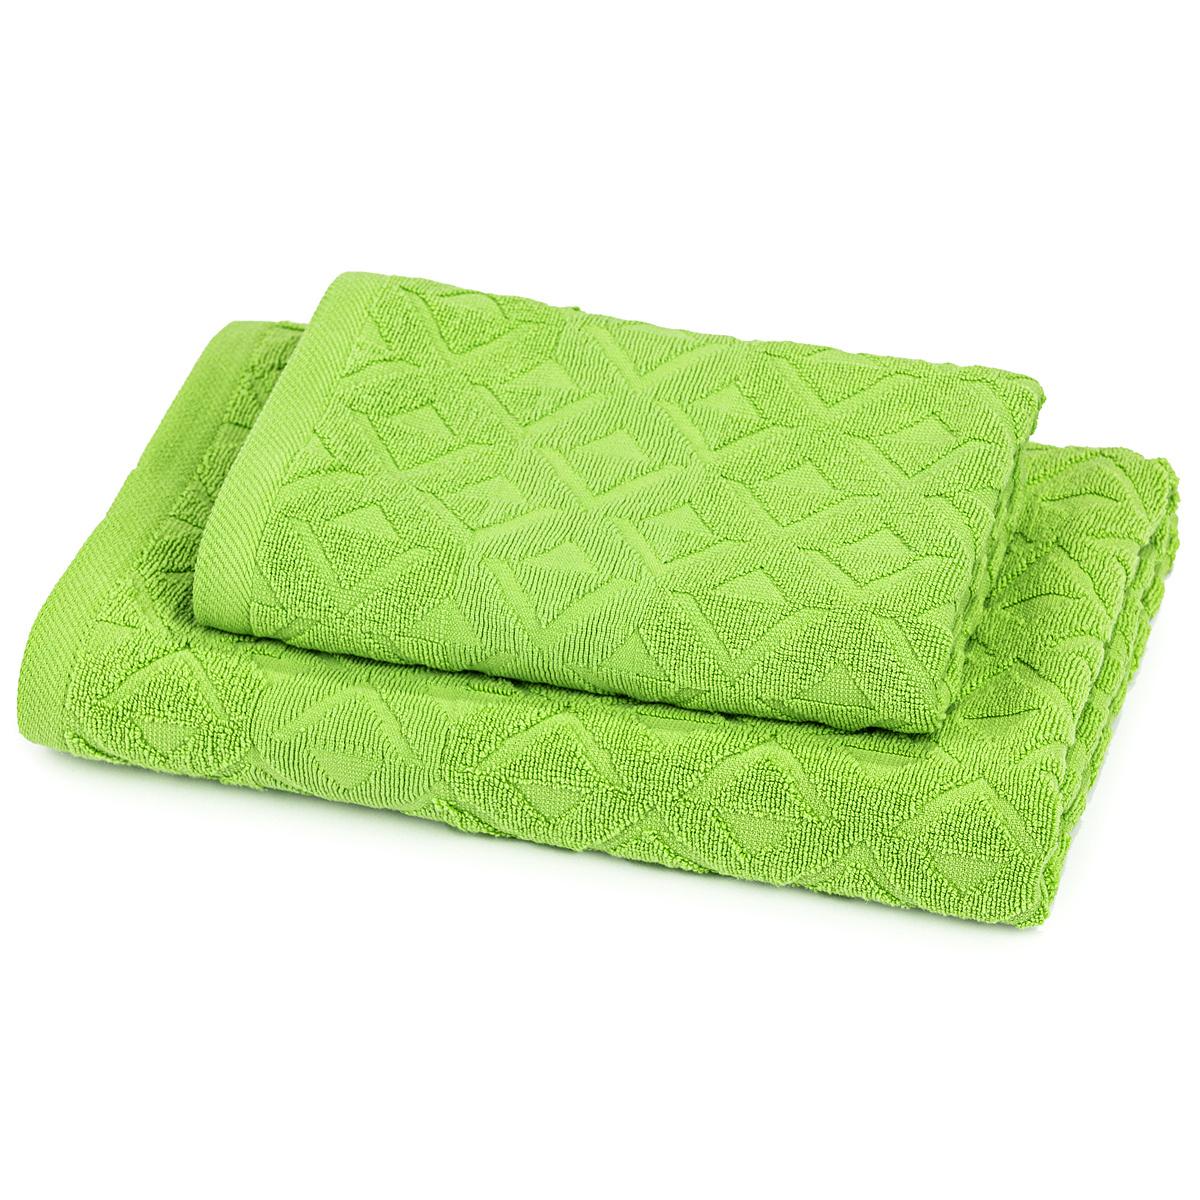 Trade Concept Sada Rio uterák a osuška zelená, 50 x 100 cm, 70 x 140 cm